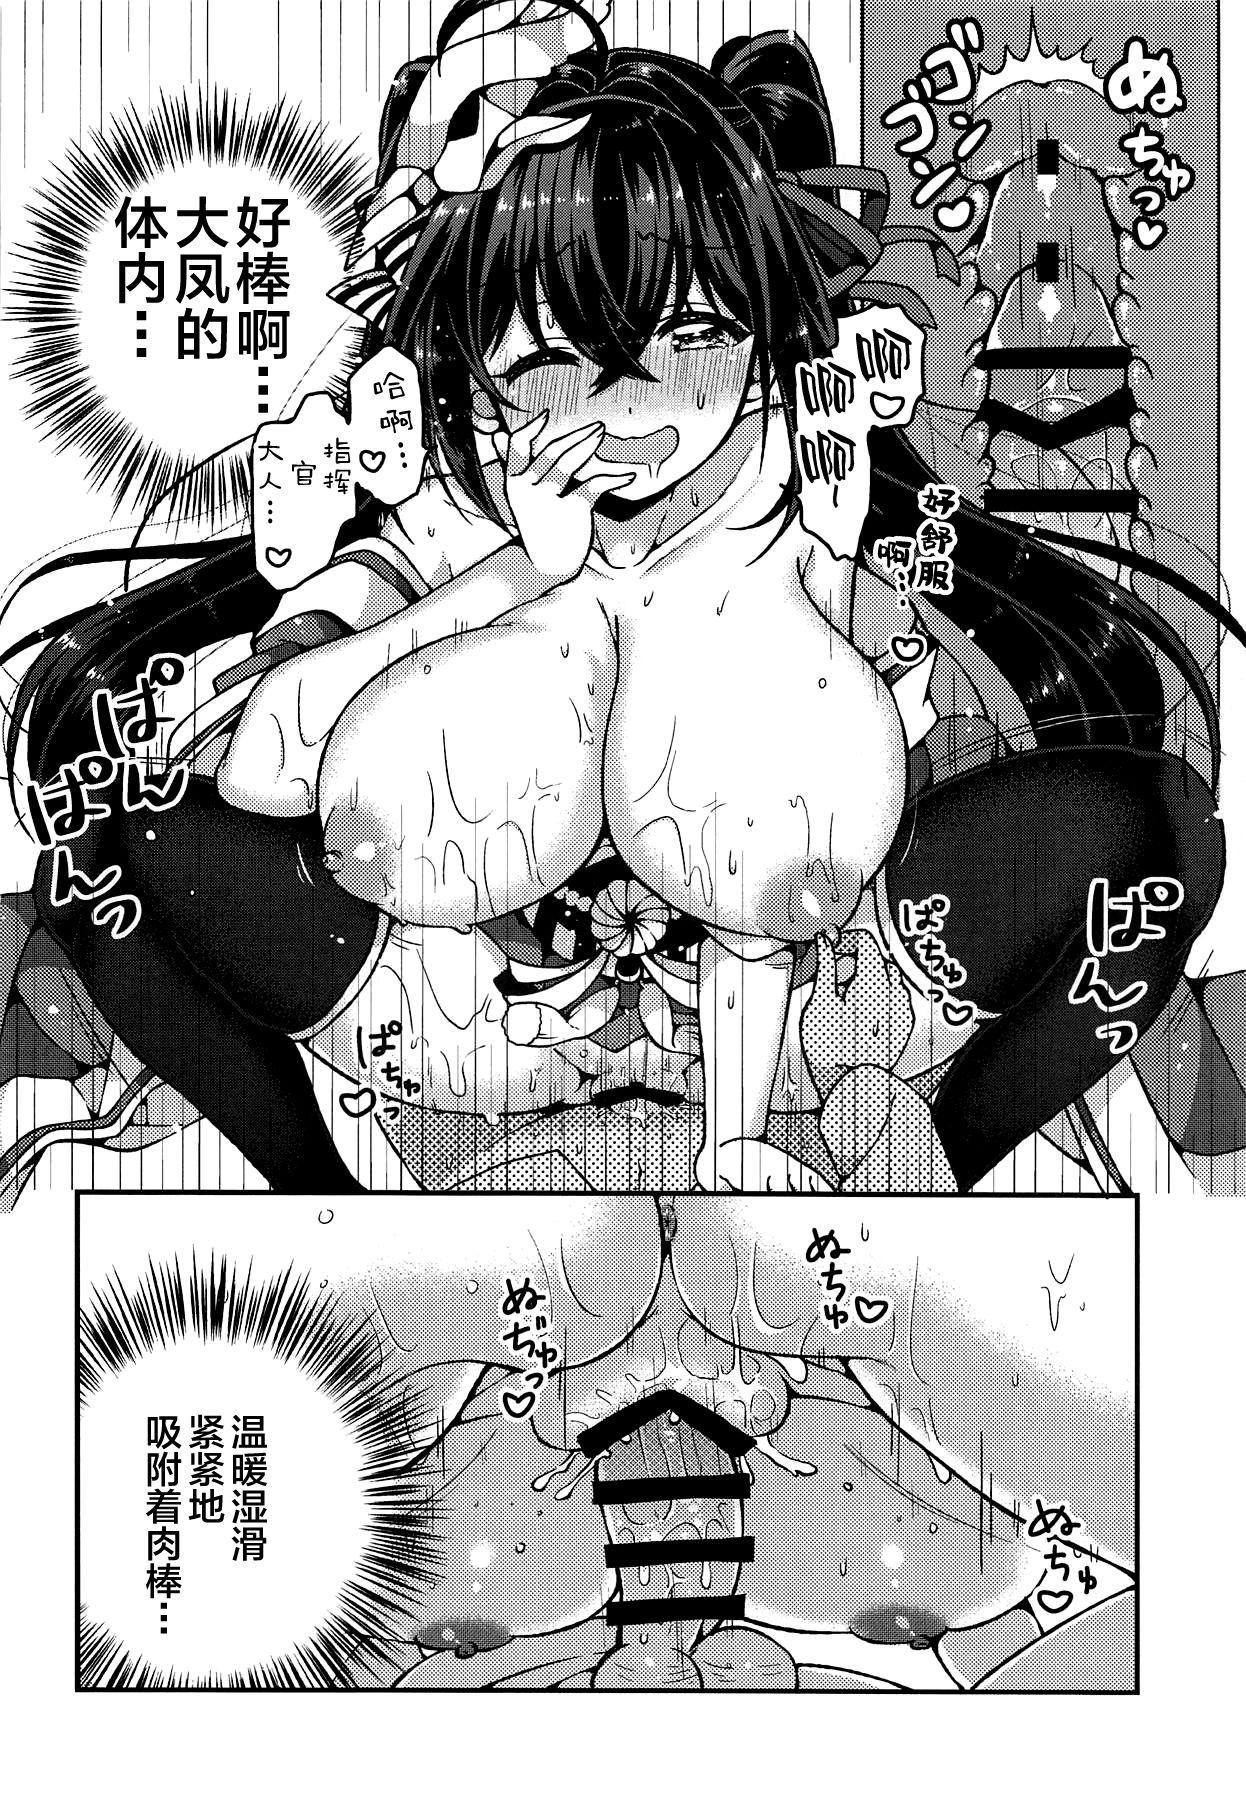 (C95) [Aratoya (Arato Asato)] Taihou-san to Amaama Sex - sweetest sex with taihou-san (Azur Lane) [Chinese] [黎欧x新桥月白日语社] 12